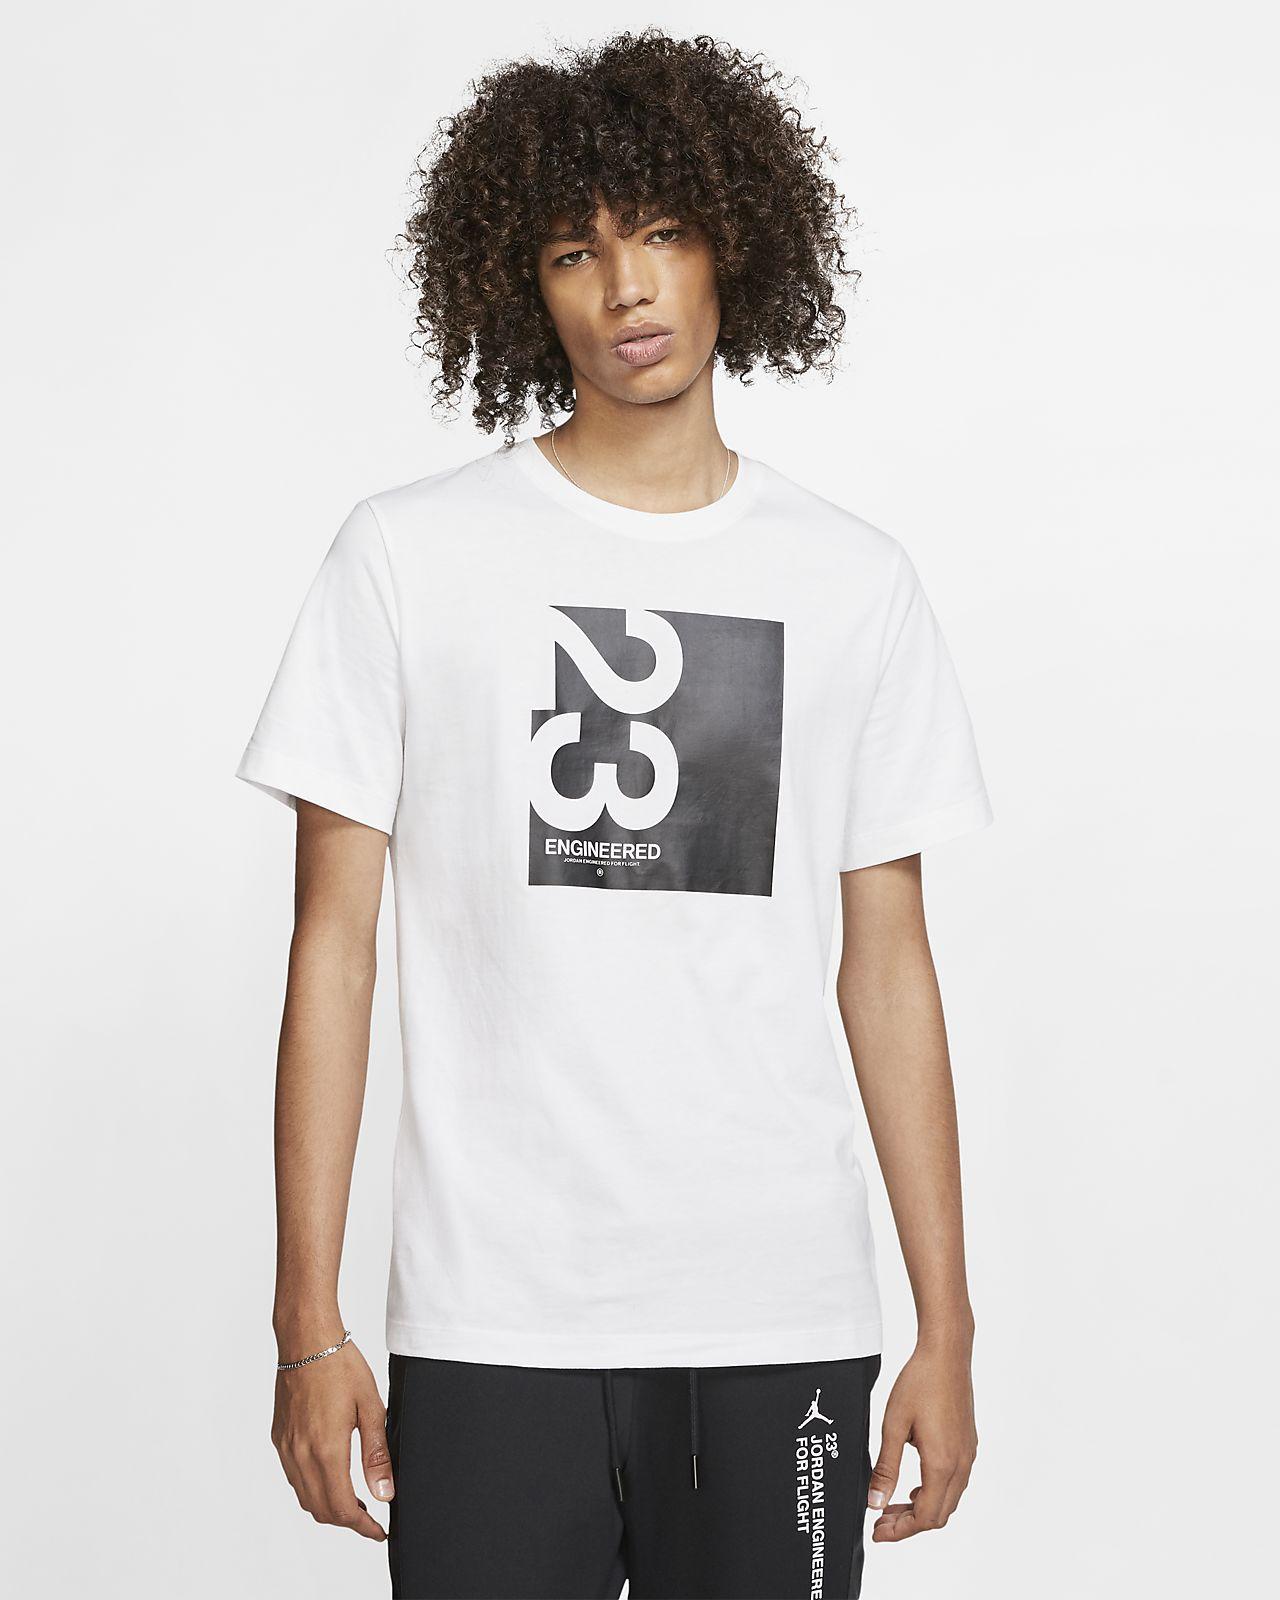 Jordan 23 Engineered 男款 T 恤